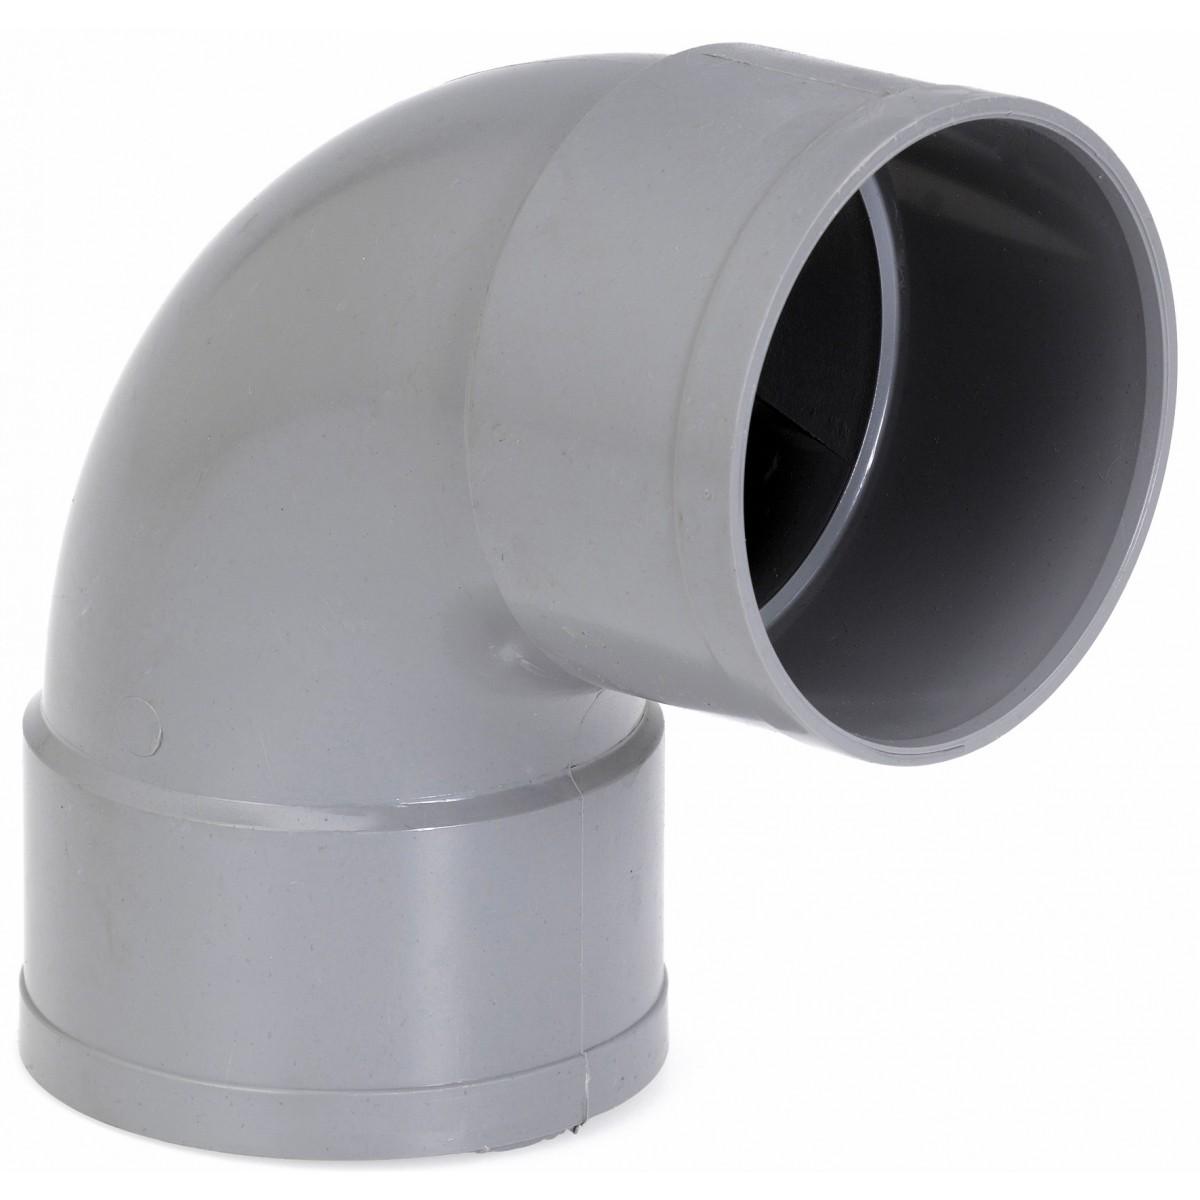 Coude à 87°30 Femelle / Femelle Girpi - Diamètre 50 mm